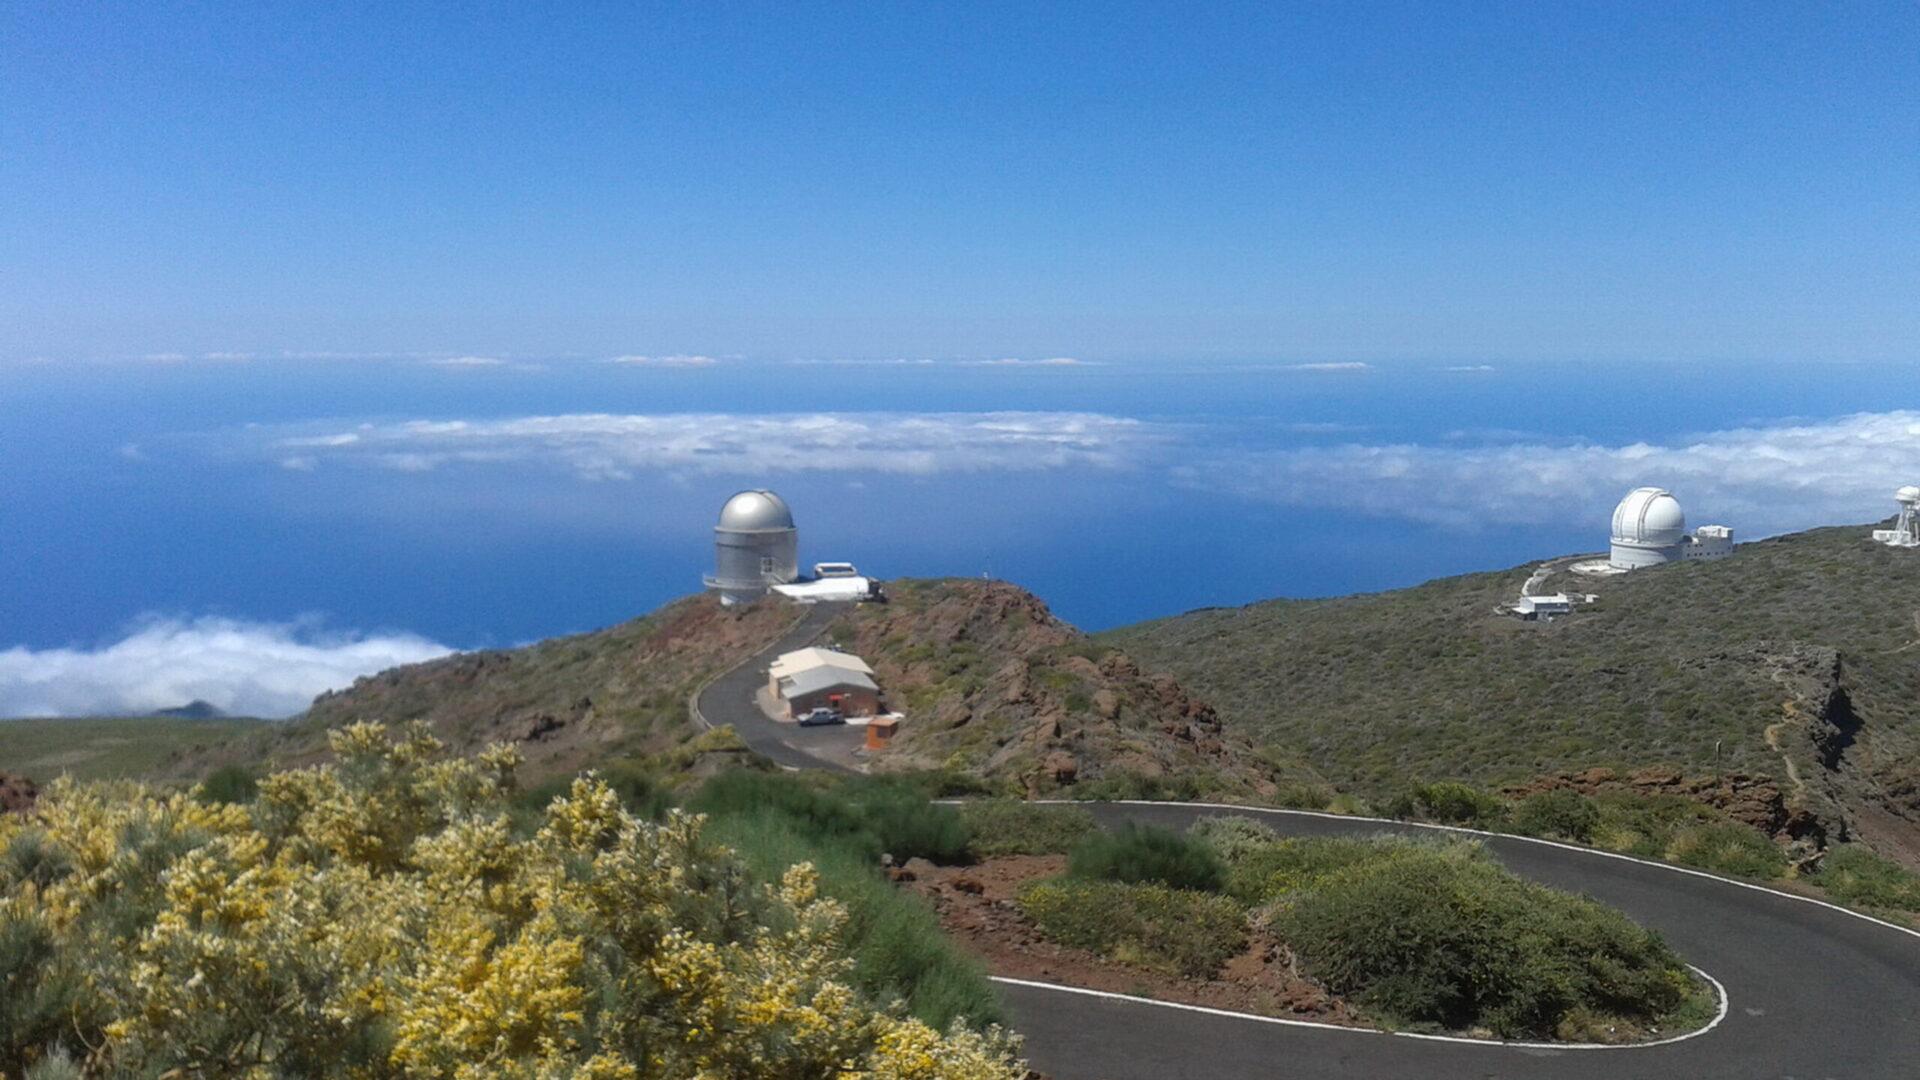 Exc. La Palma Spezial Viajes Pamir (3) Inselgipfel Observatorien